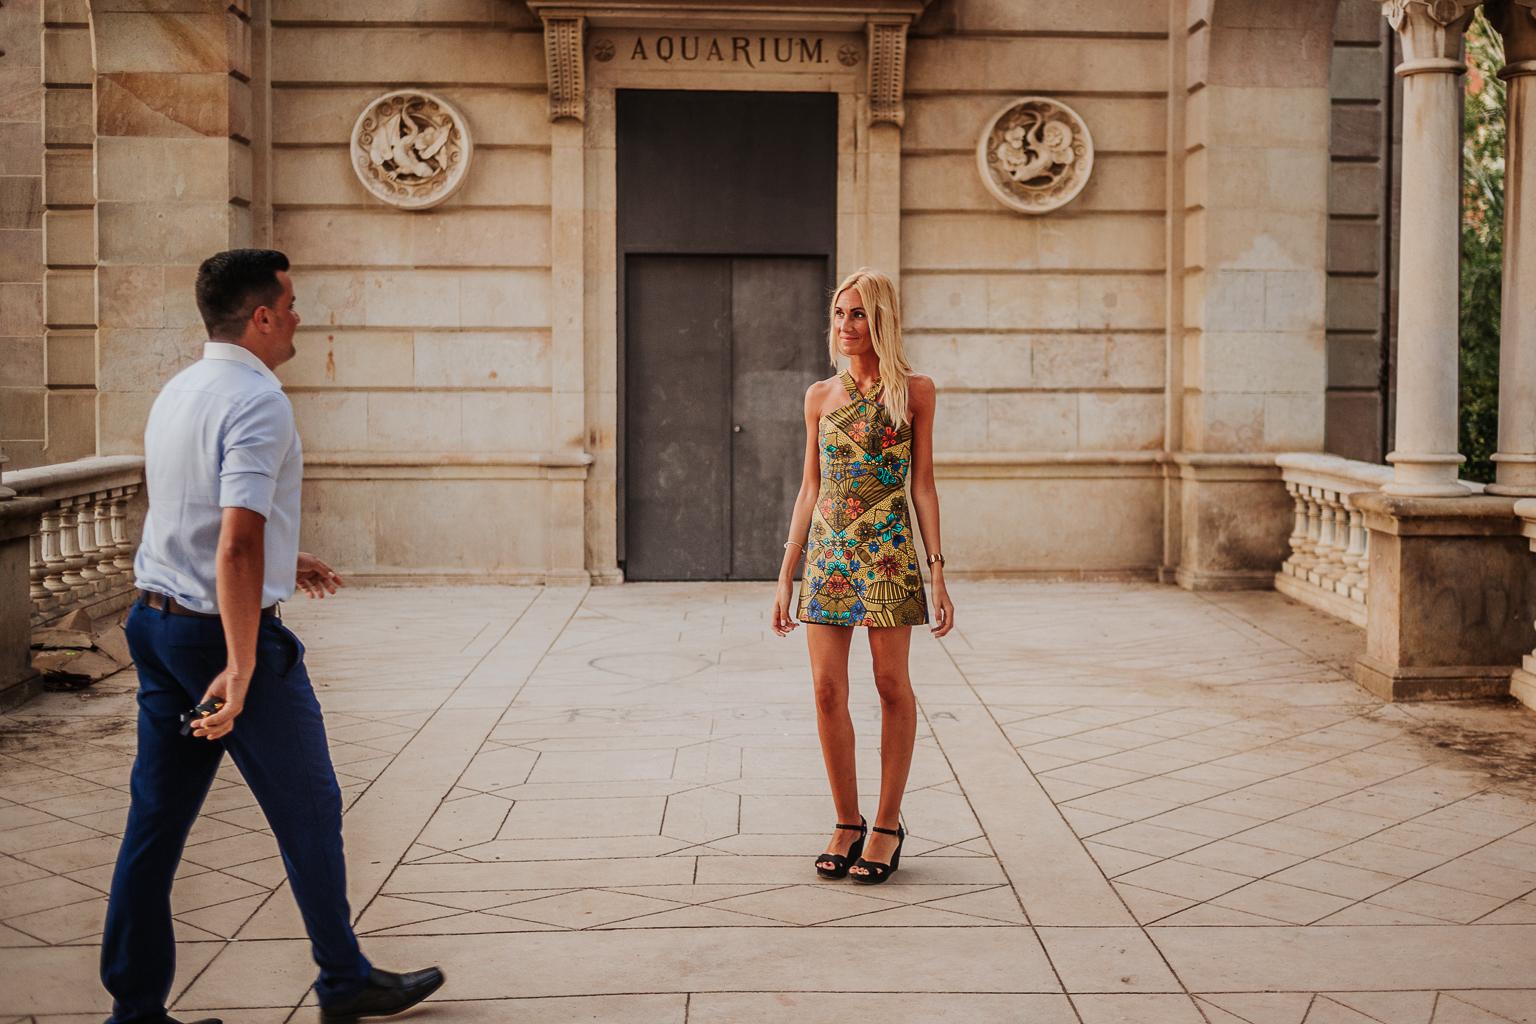 Fotógrafo de preboda :: Fotografo de pareja Barcelona :: Reportaje pareja Barcelona :: Pedida de mano sorpresa :: Reportaje de pedida de mano :: Barcelona wedding photographer :: Barcelona photographer